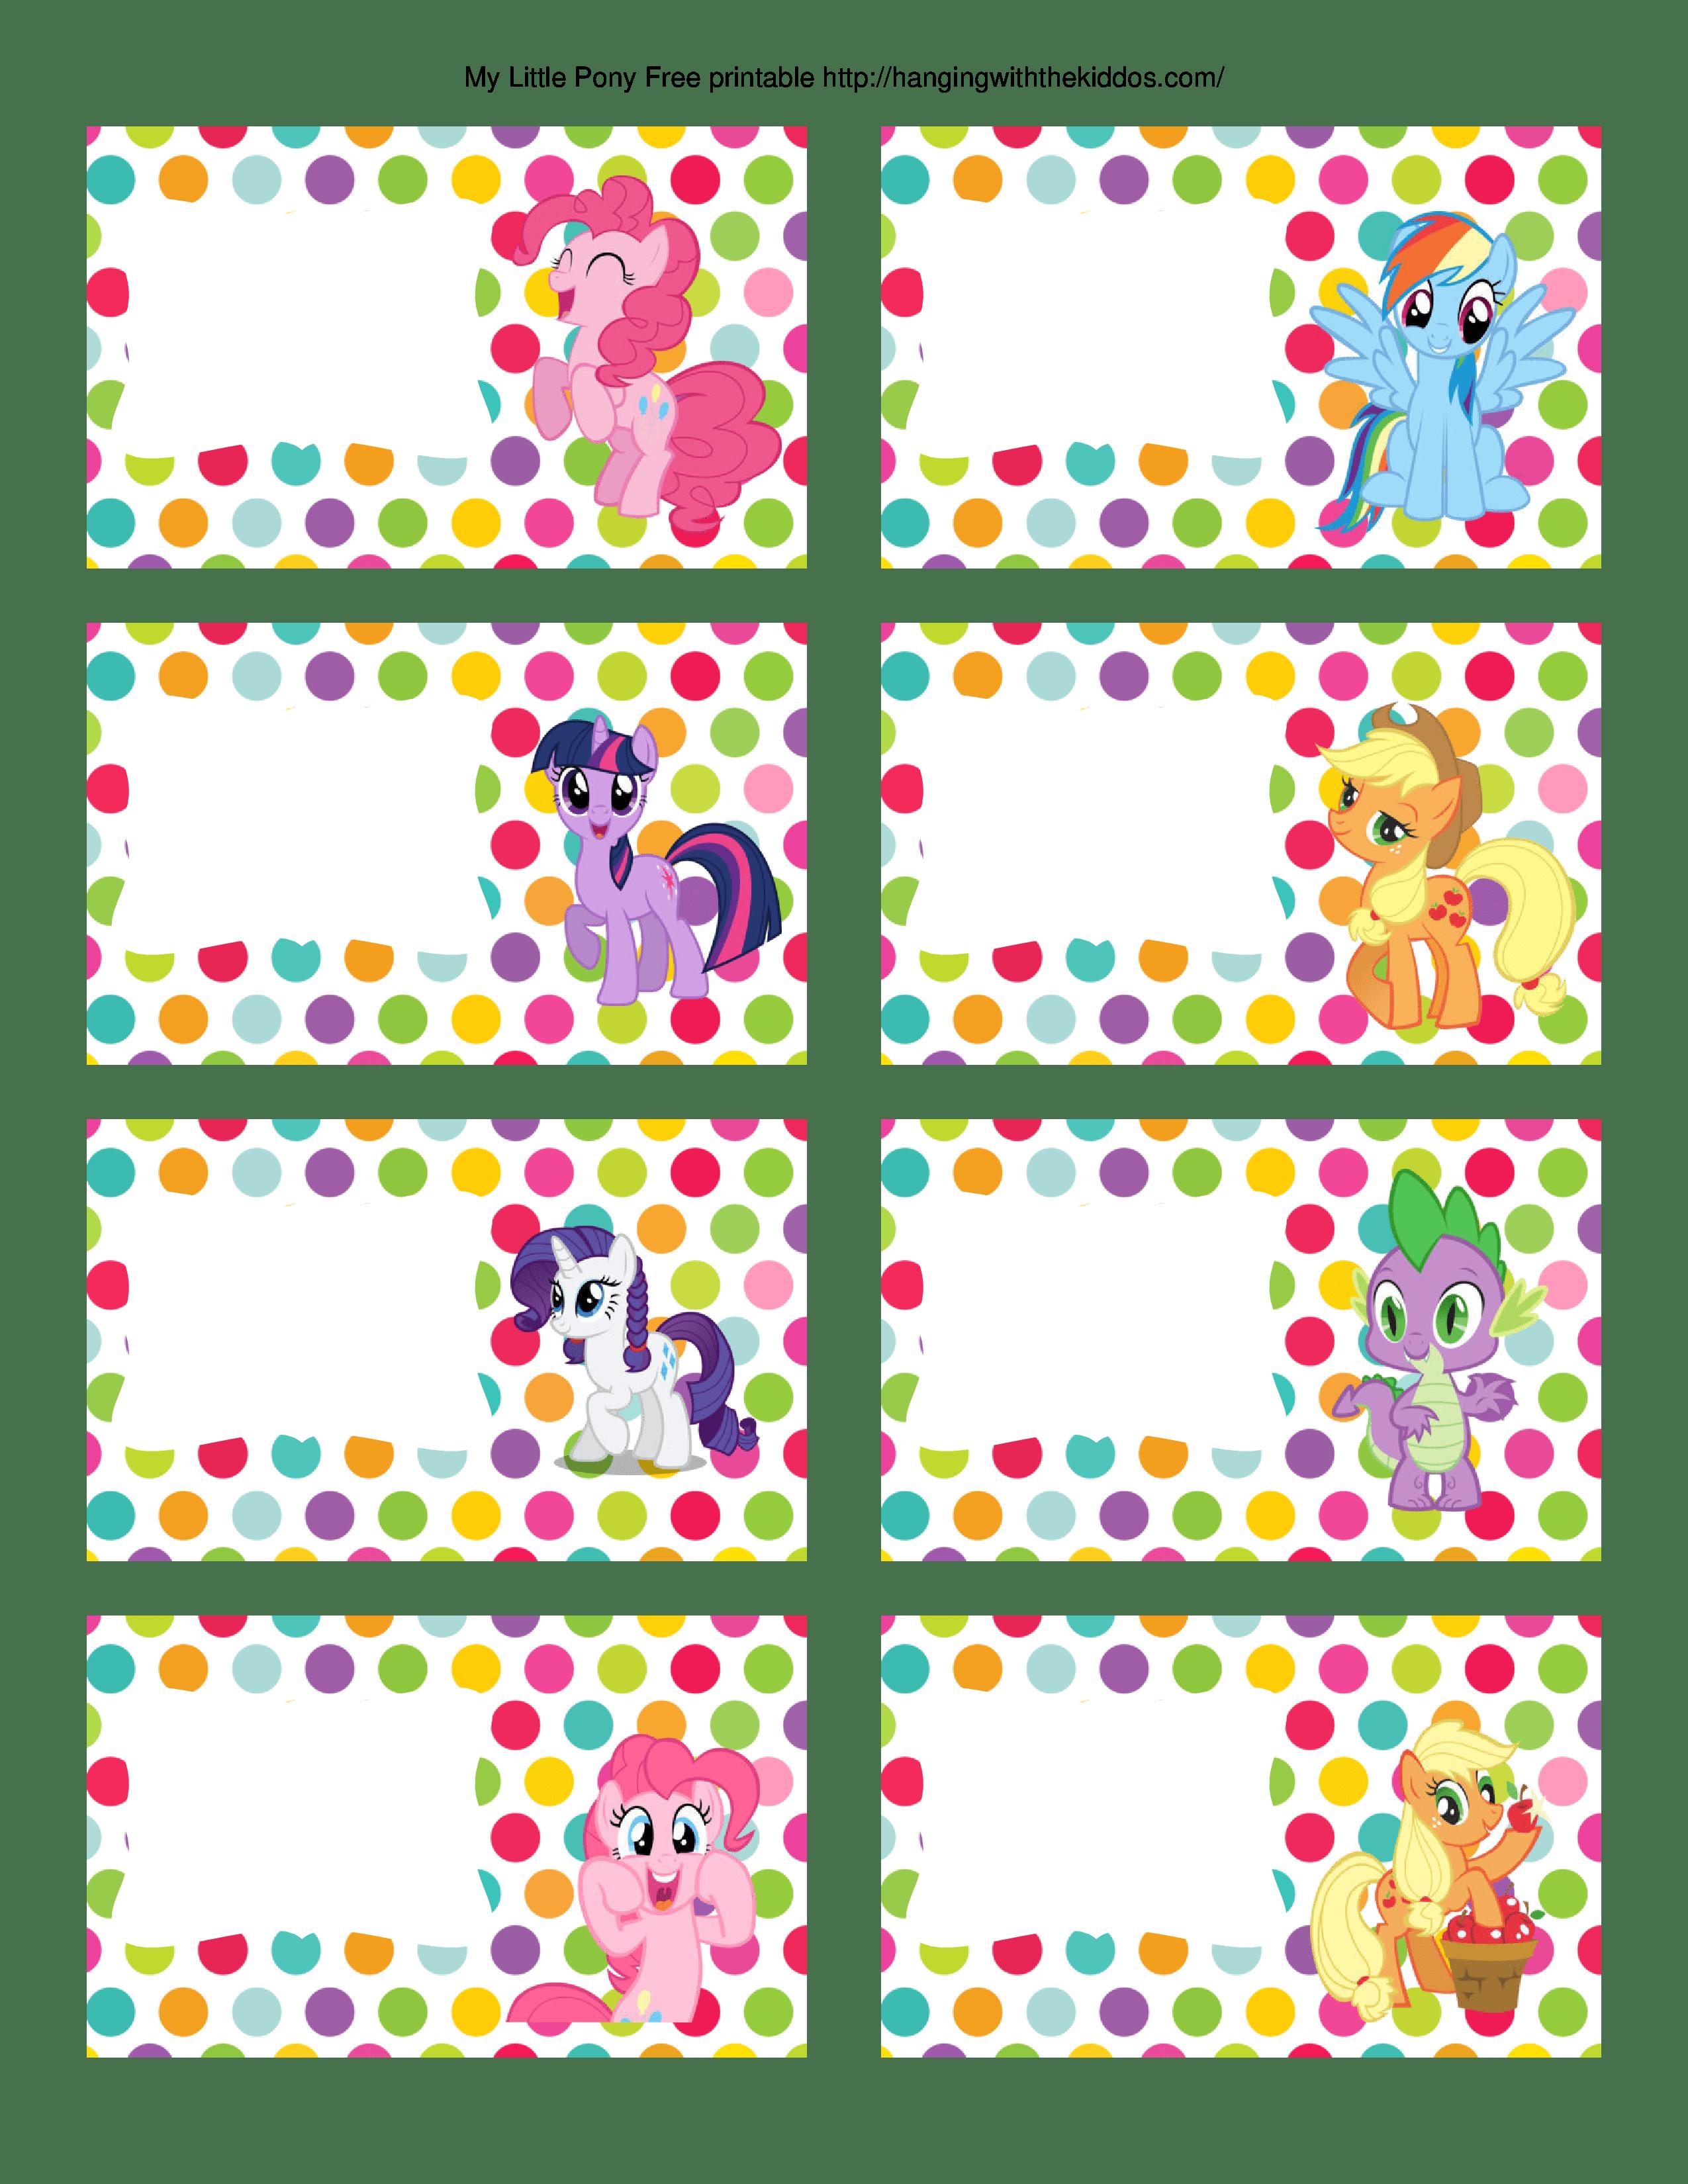 25 My Little Pony Party Ideas Freebies